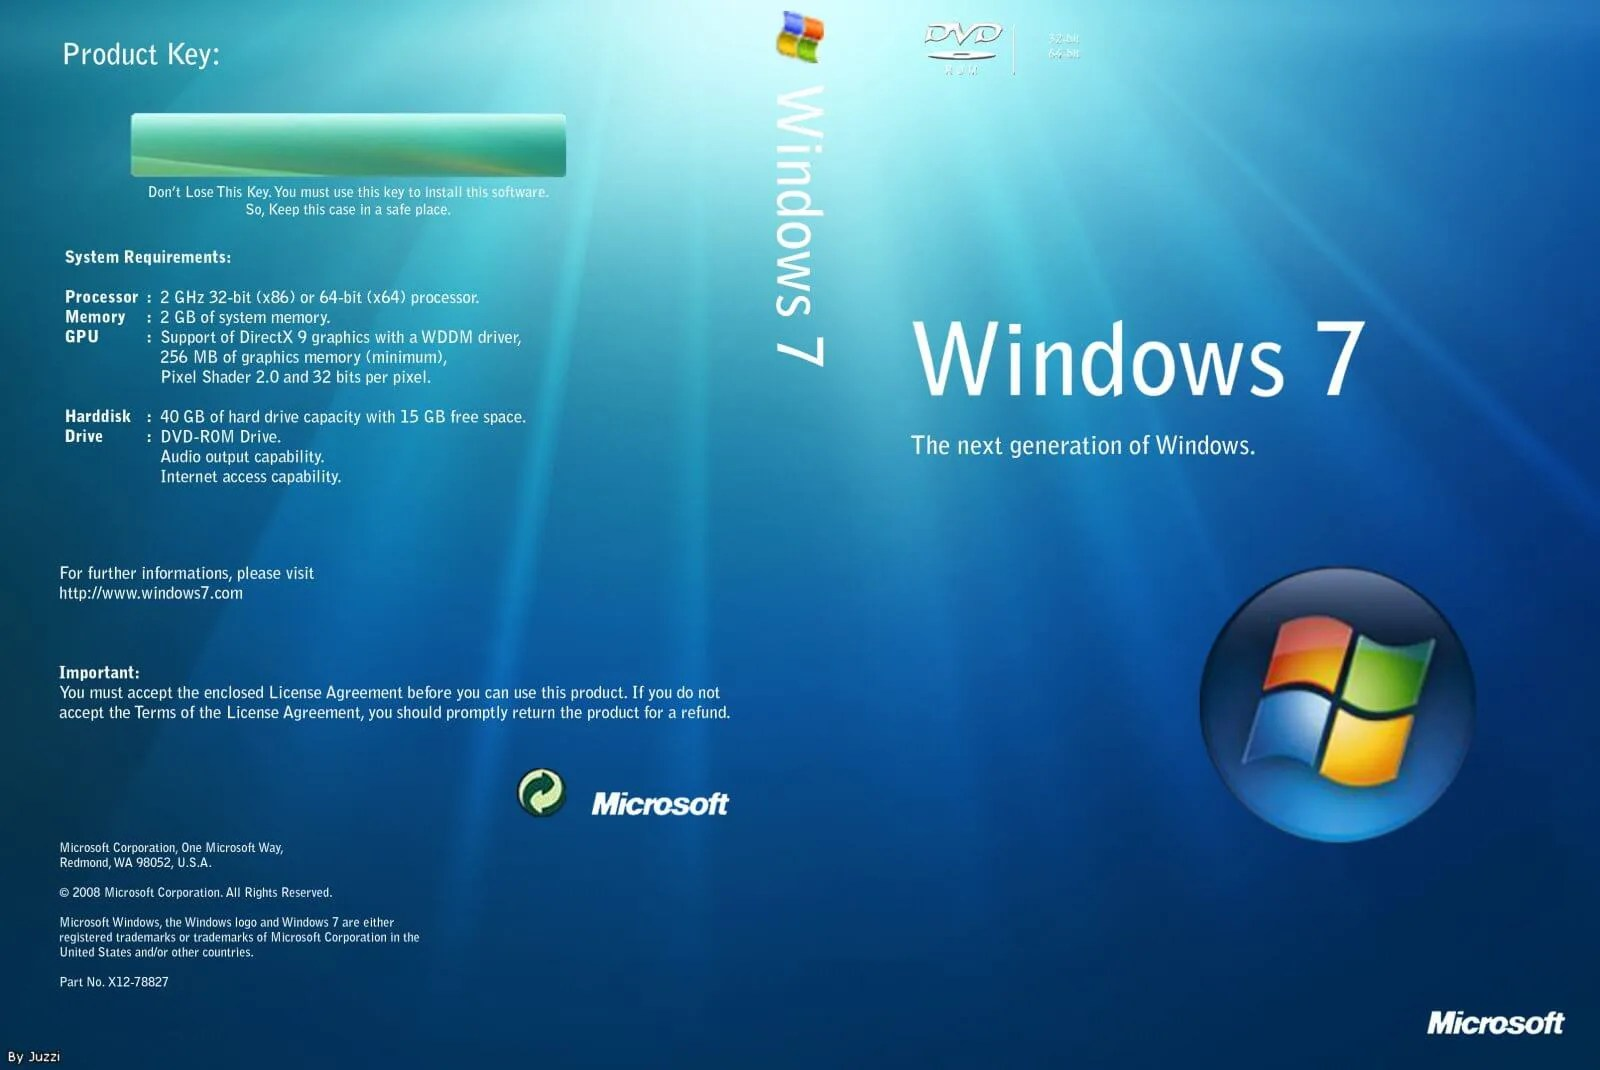 SCARICARE WINDOWS 7 64 BIT ITALIANO - Bigwhitecloudrecs